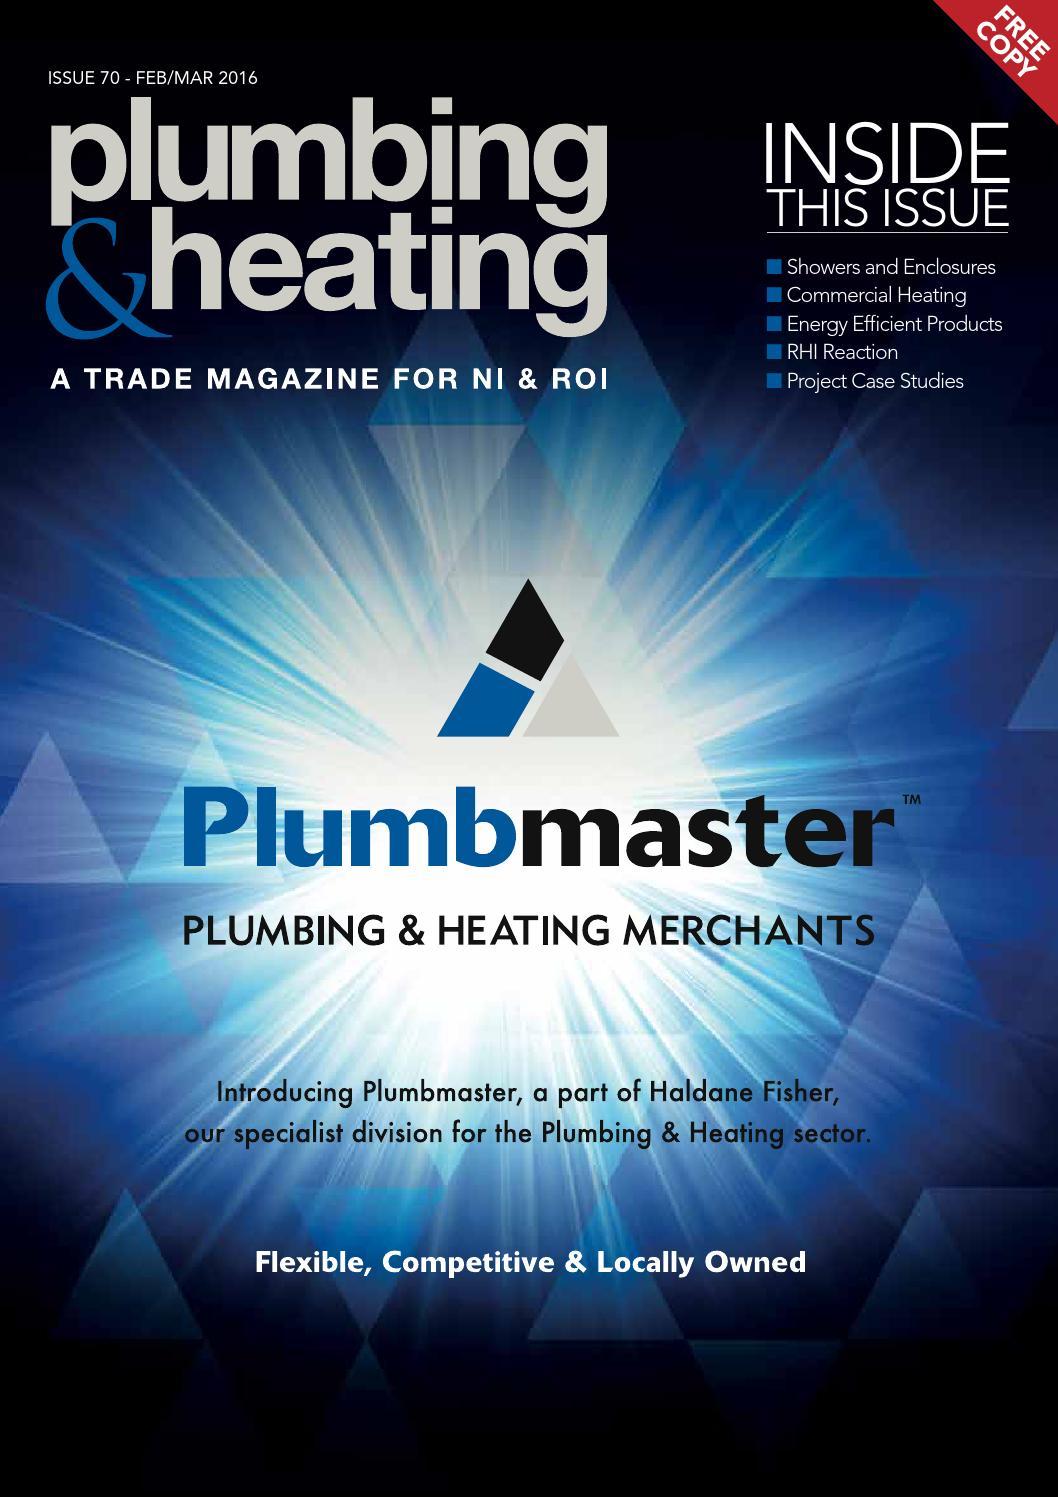 Plumbing and Heating Magazine Issue70 by Karen McAvoy Publishing - issuu